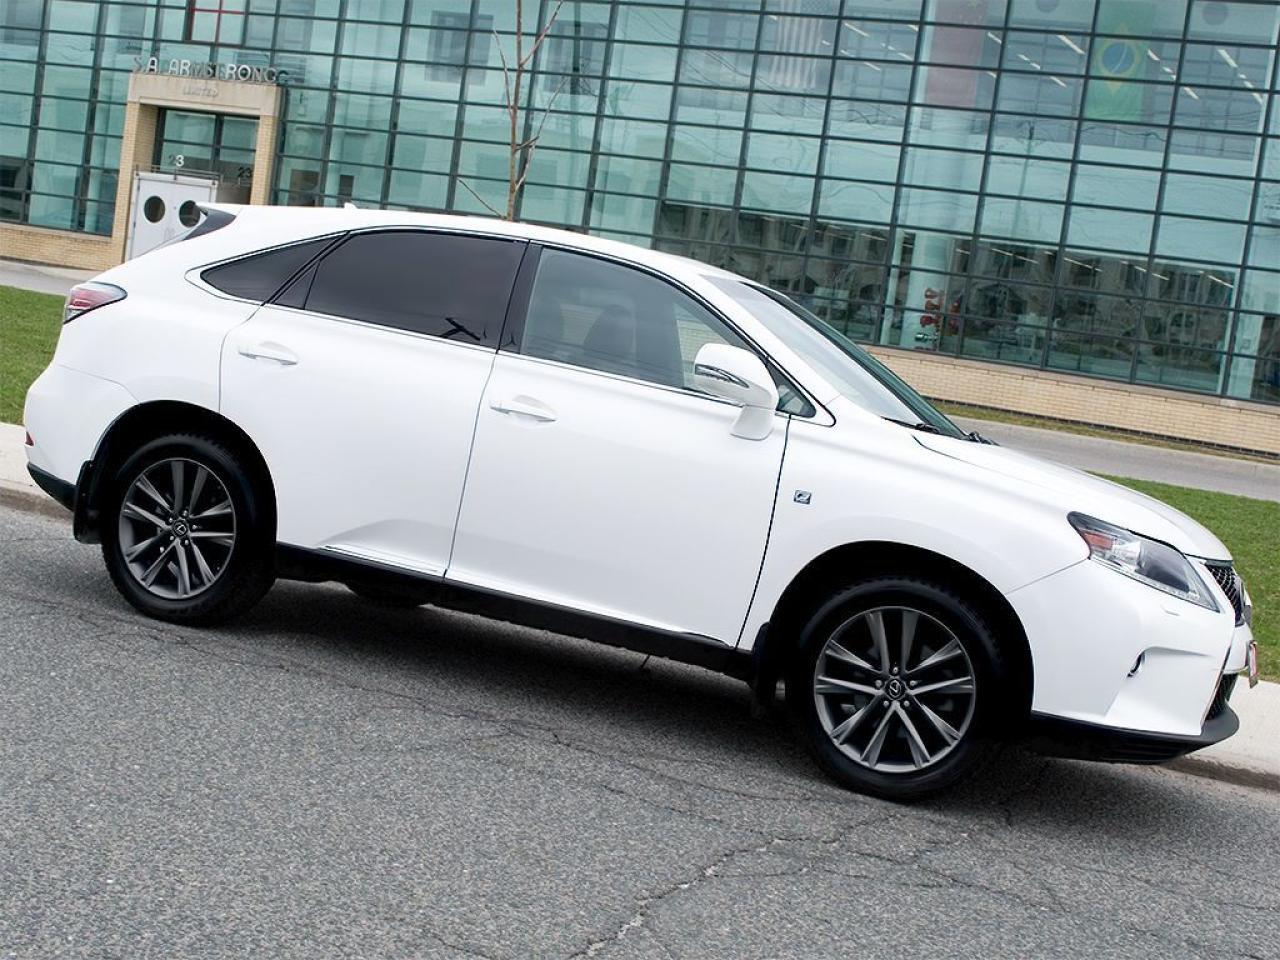 2013 Lexus RX 350 F SPORT|NAVI|REARCAM|HEADS UP DISPLAY